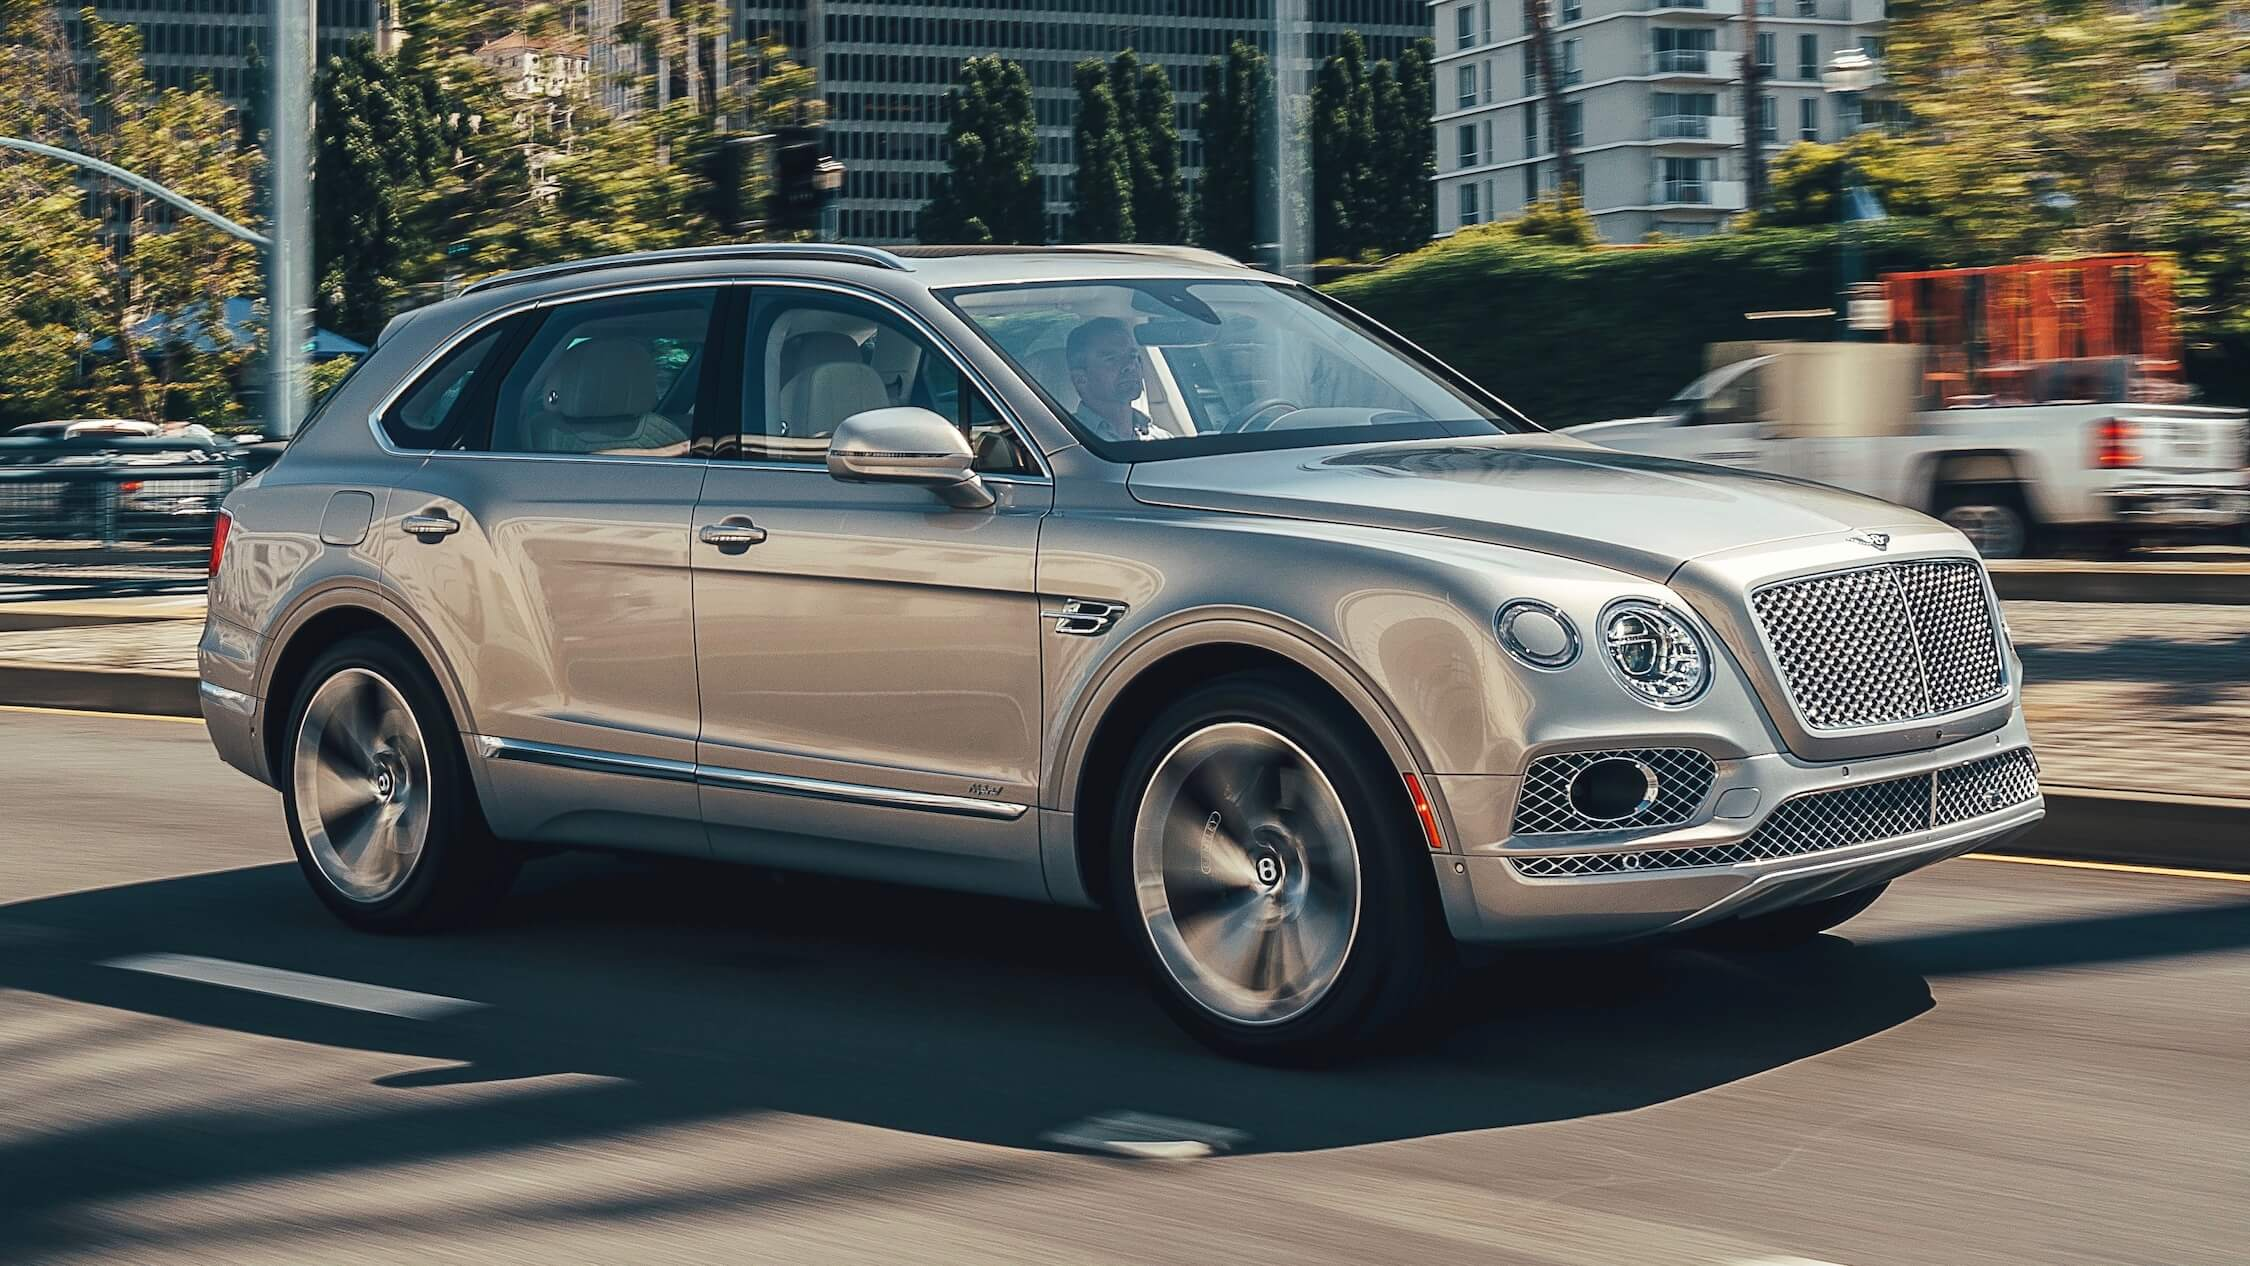 Bentley Bentayga cinzento